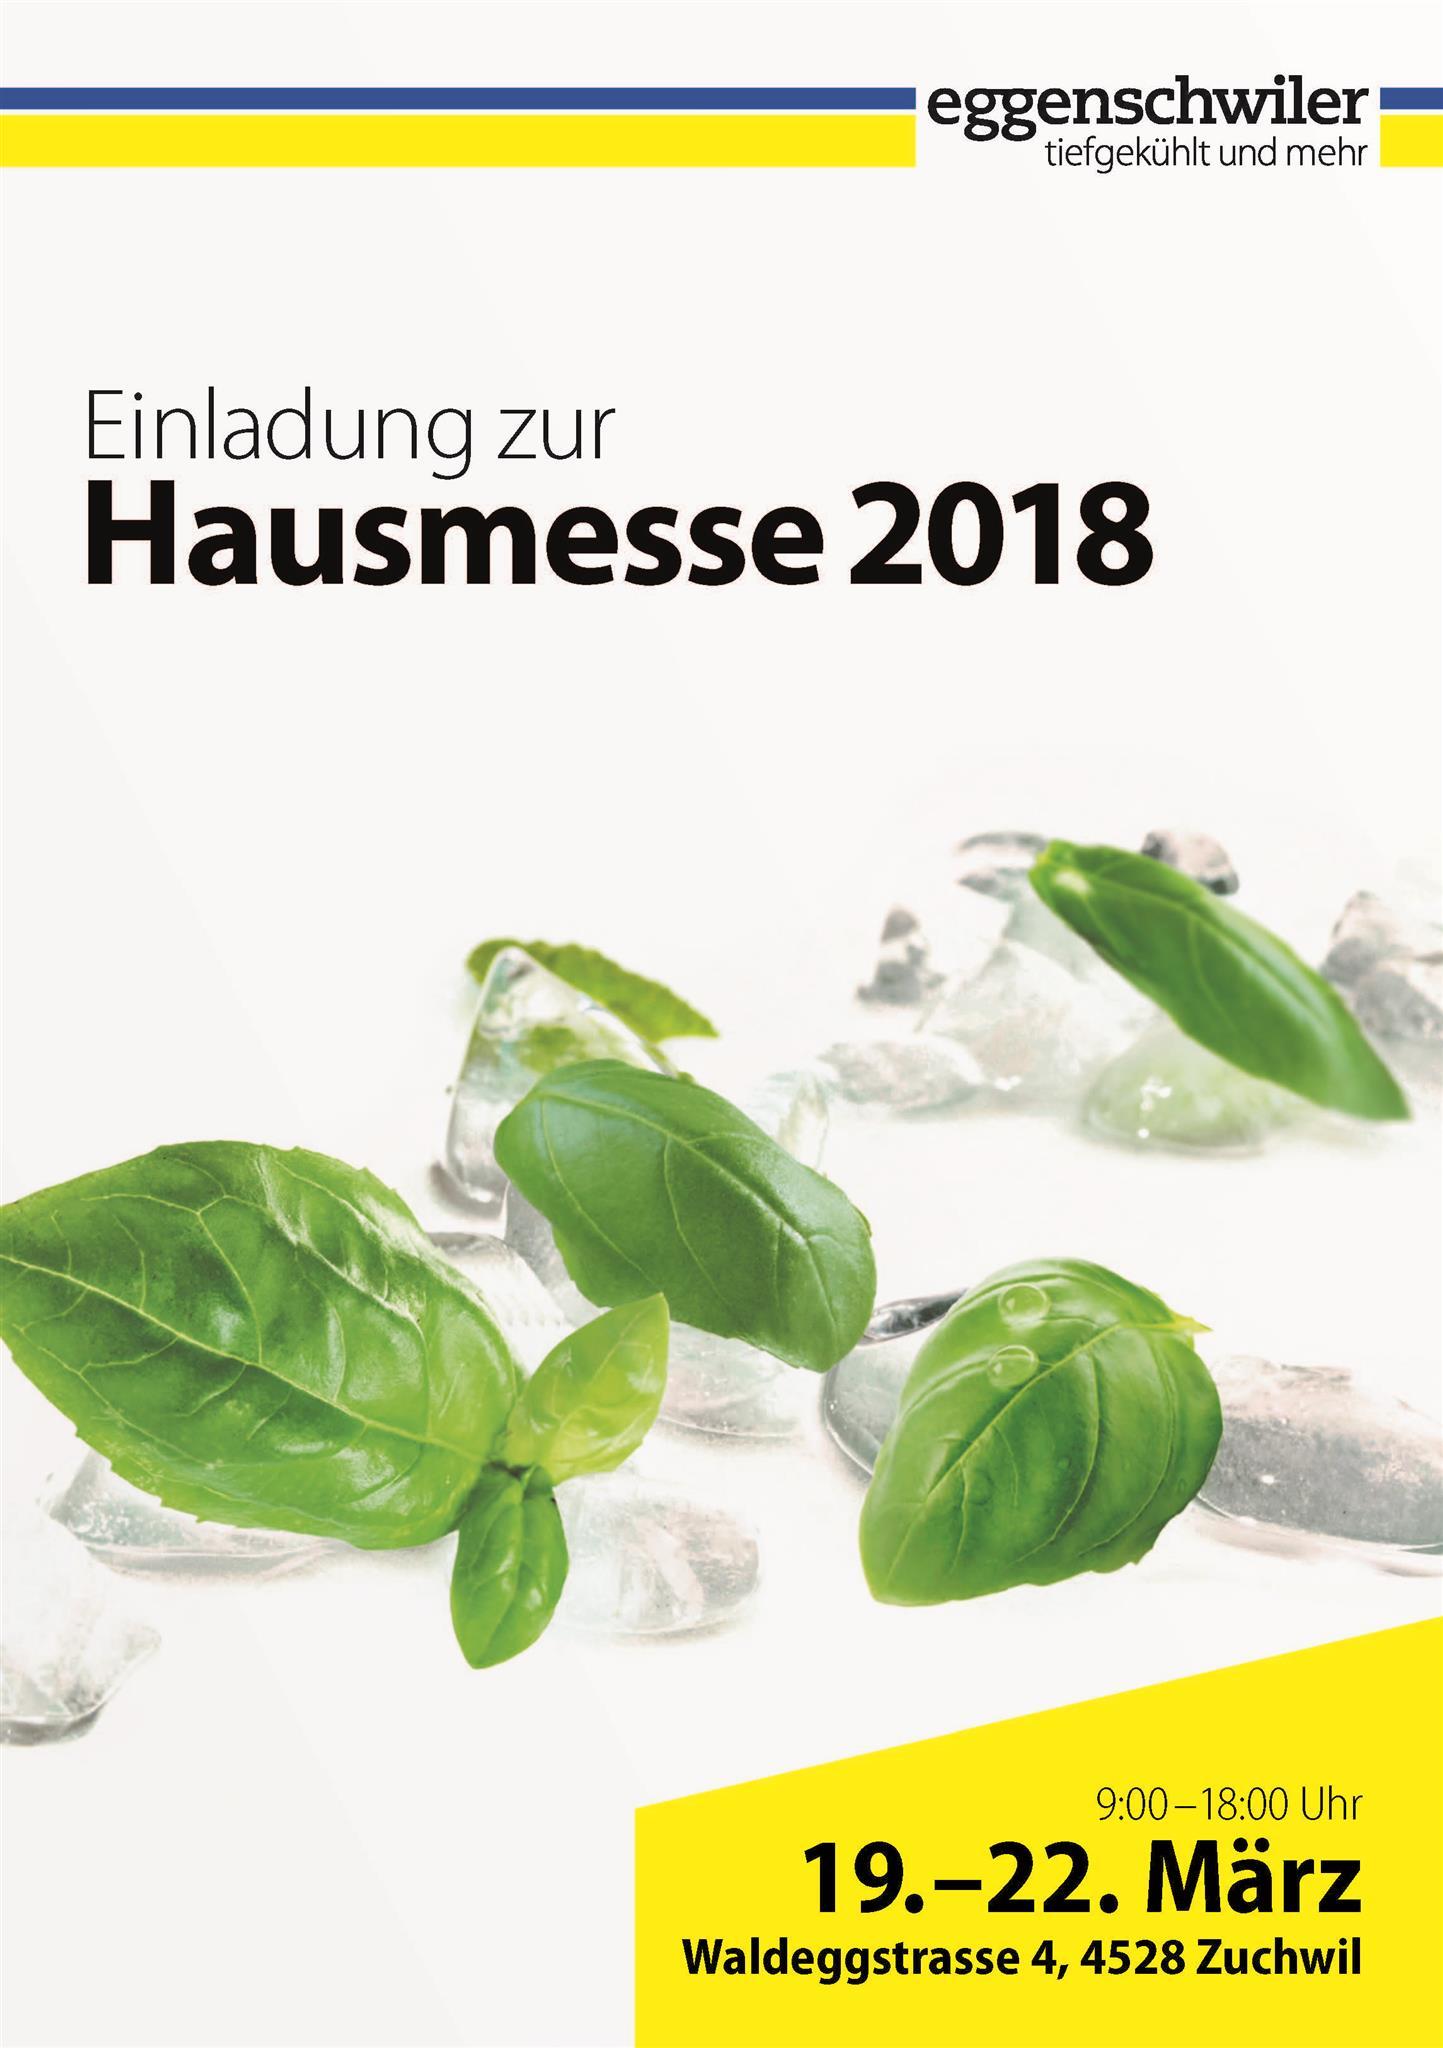 Eggenschwiler Hausmesse 2018